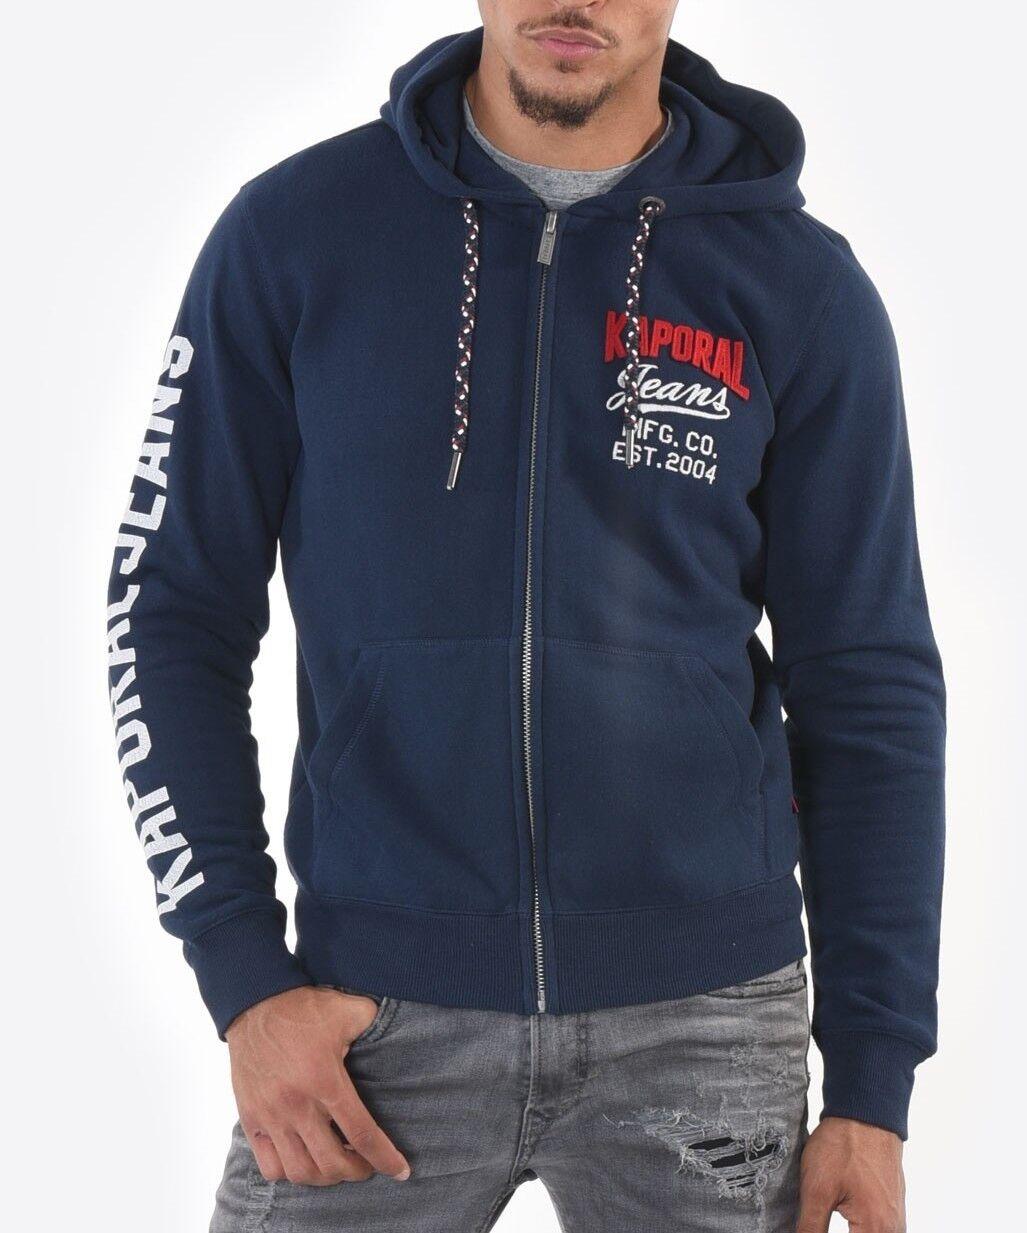 Zip Sweatshirt Kapuzenpulli Kaporal Muzak Marineblau   | Online Shop